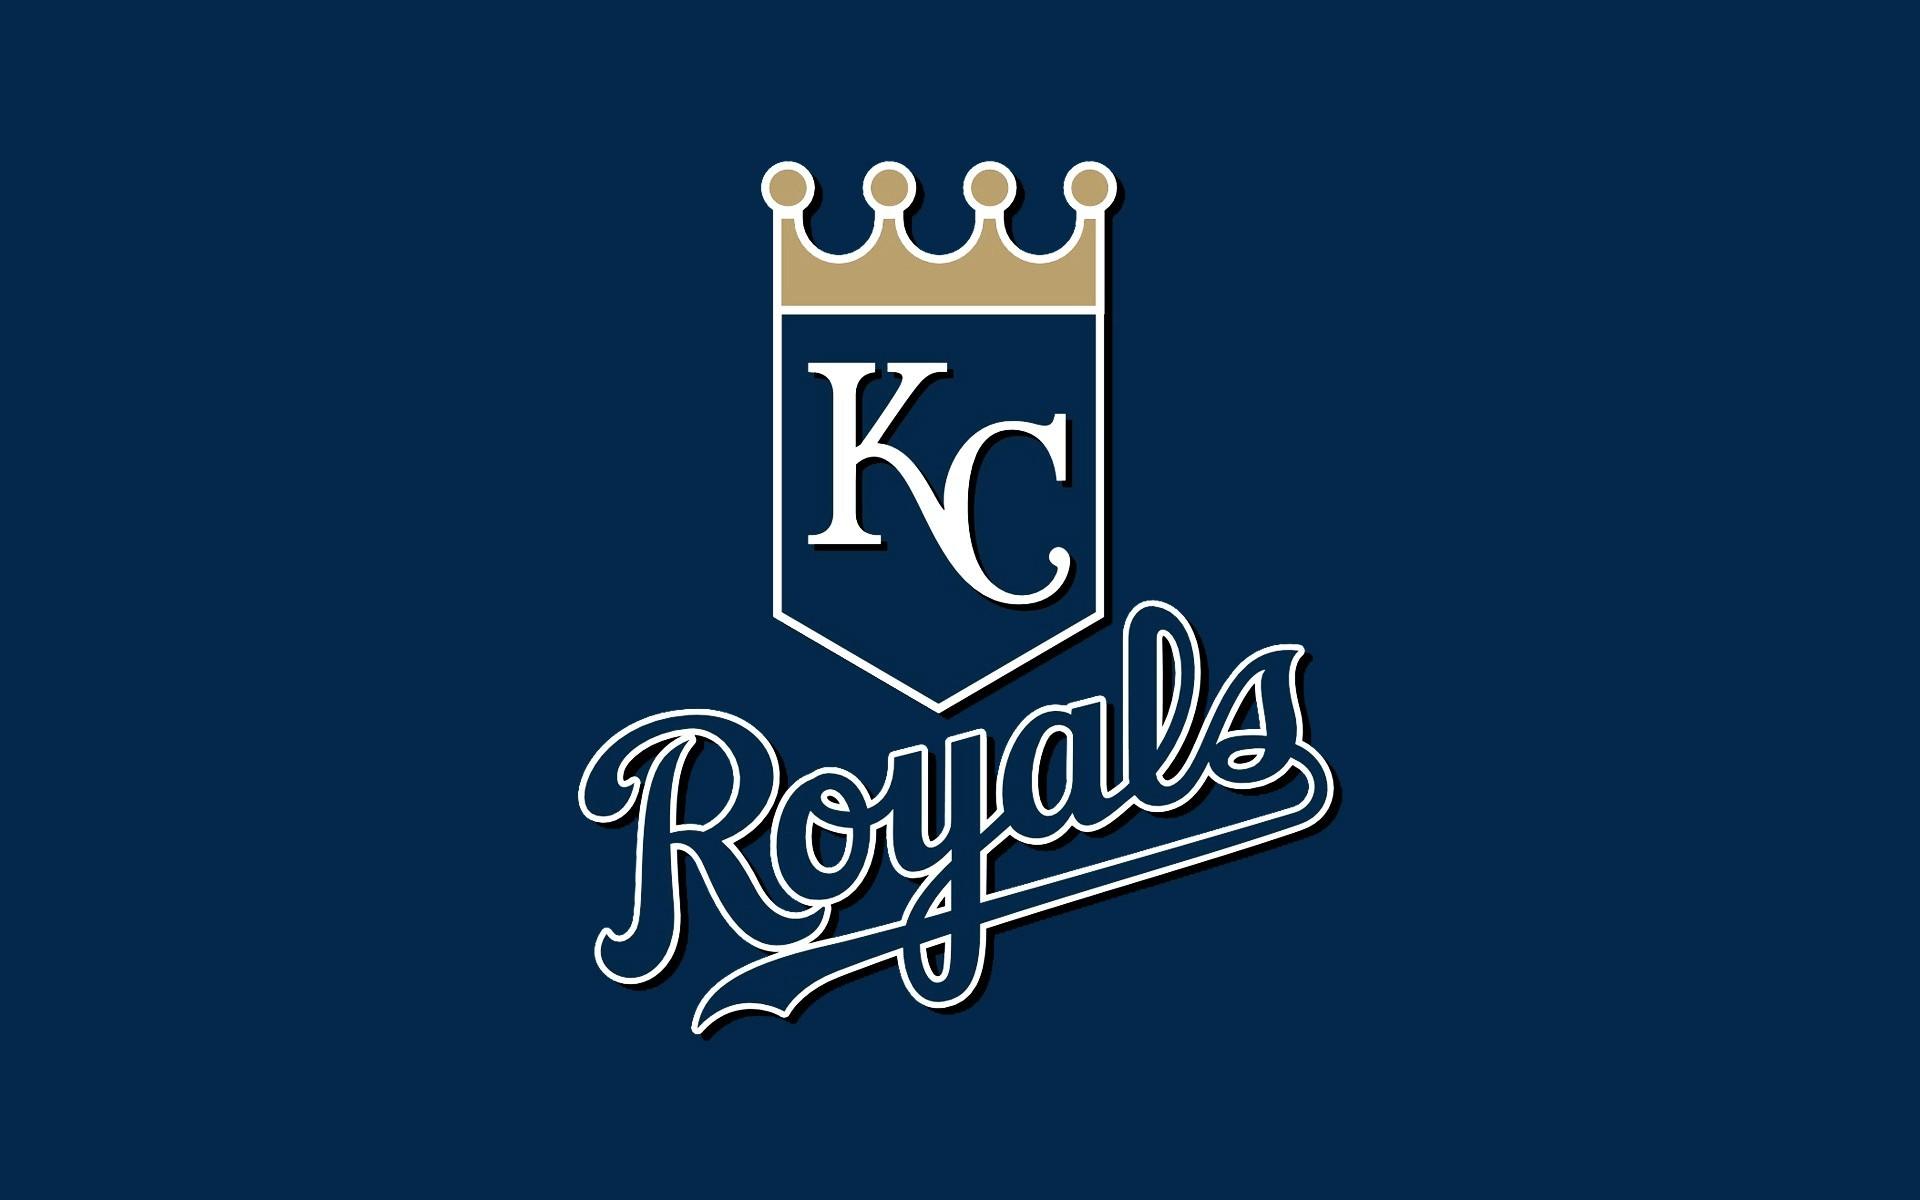 … Wallpaper Desktop; Kansas City Royals Wallpaper 2017 …